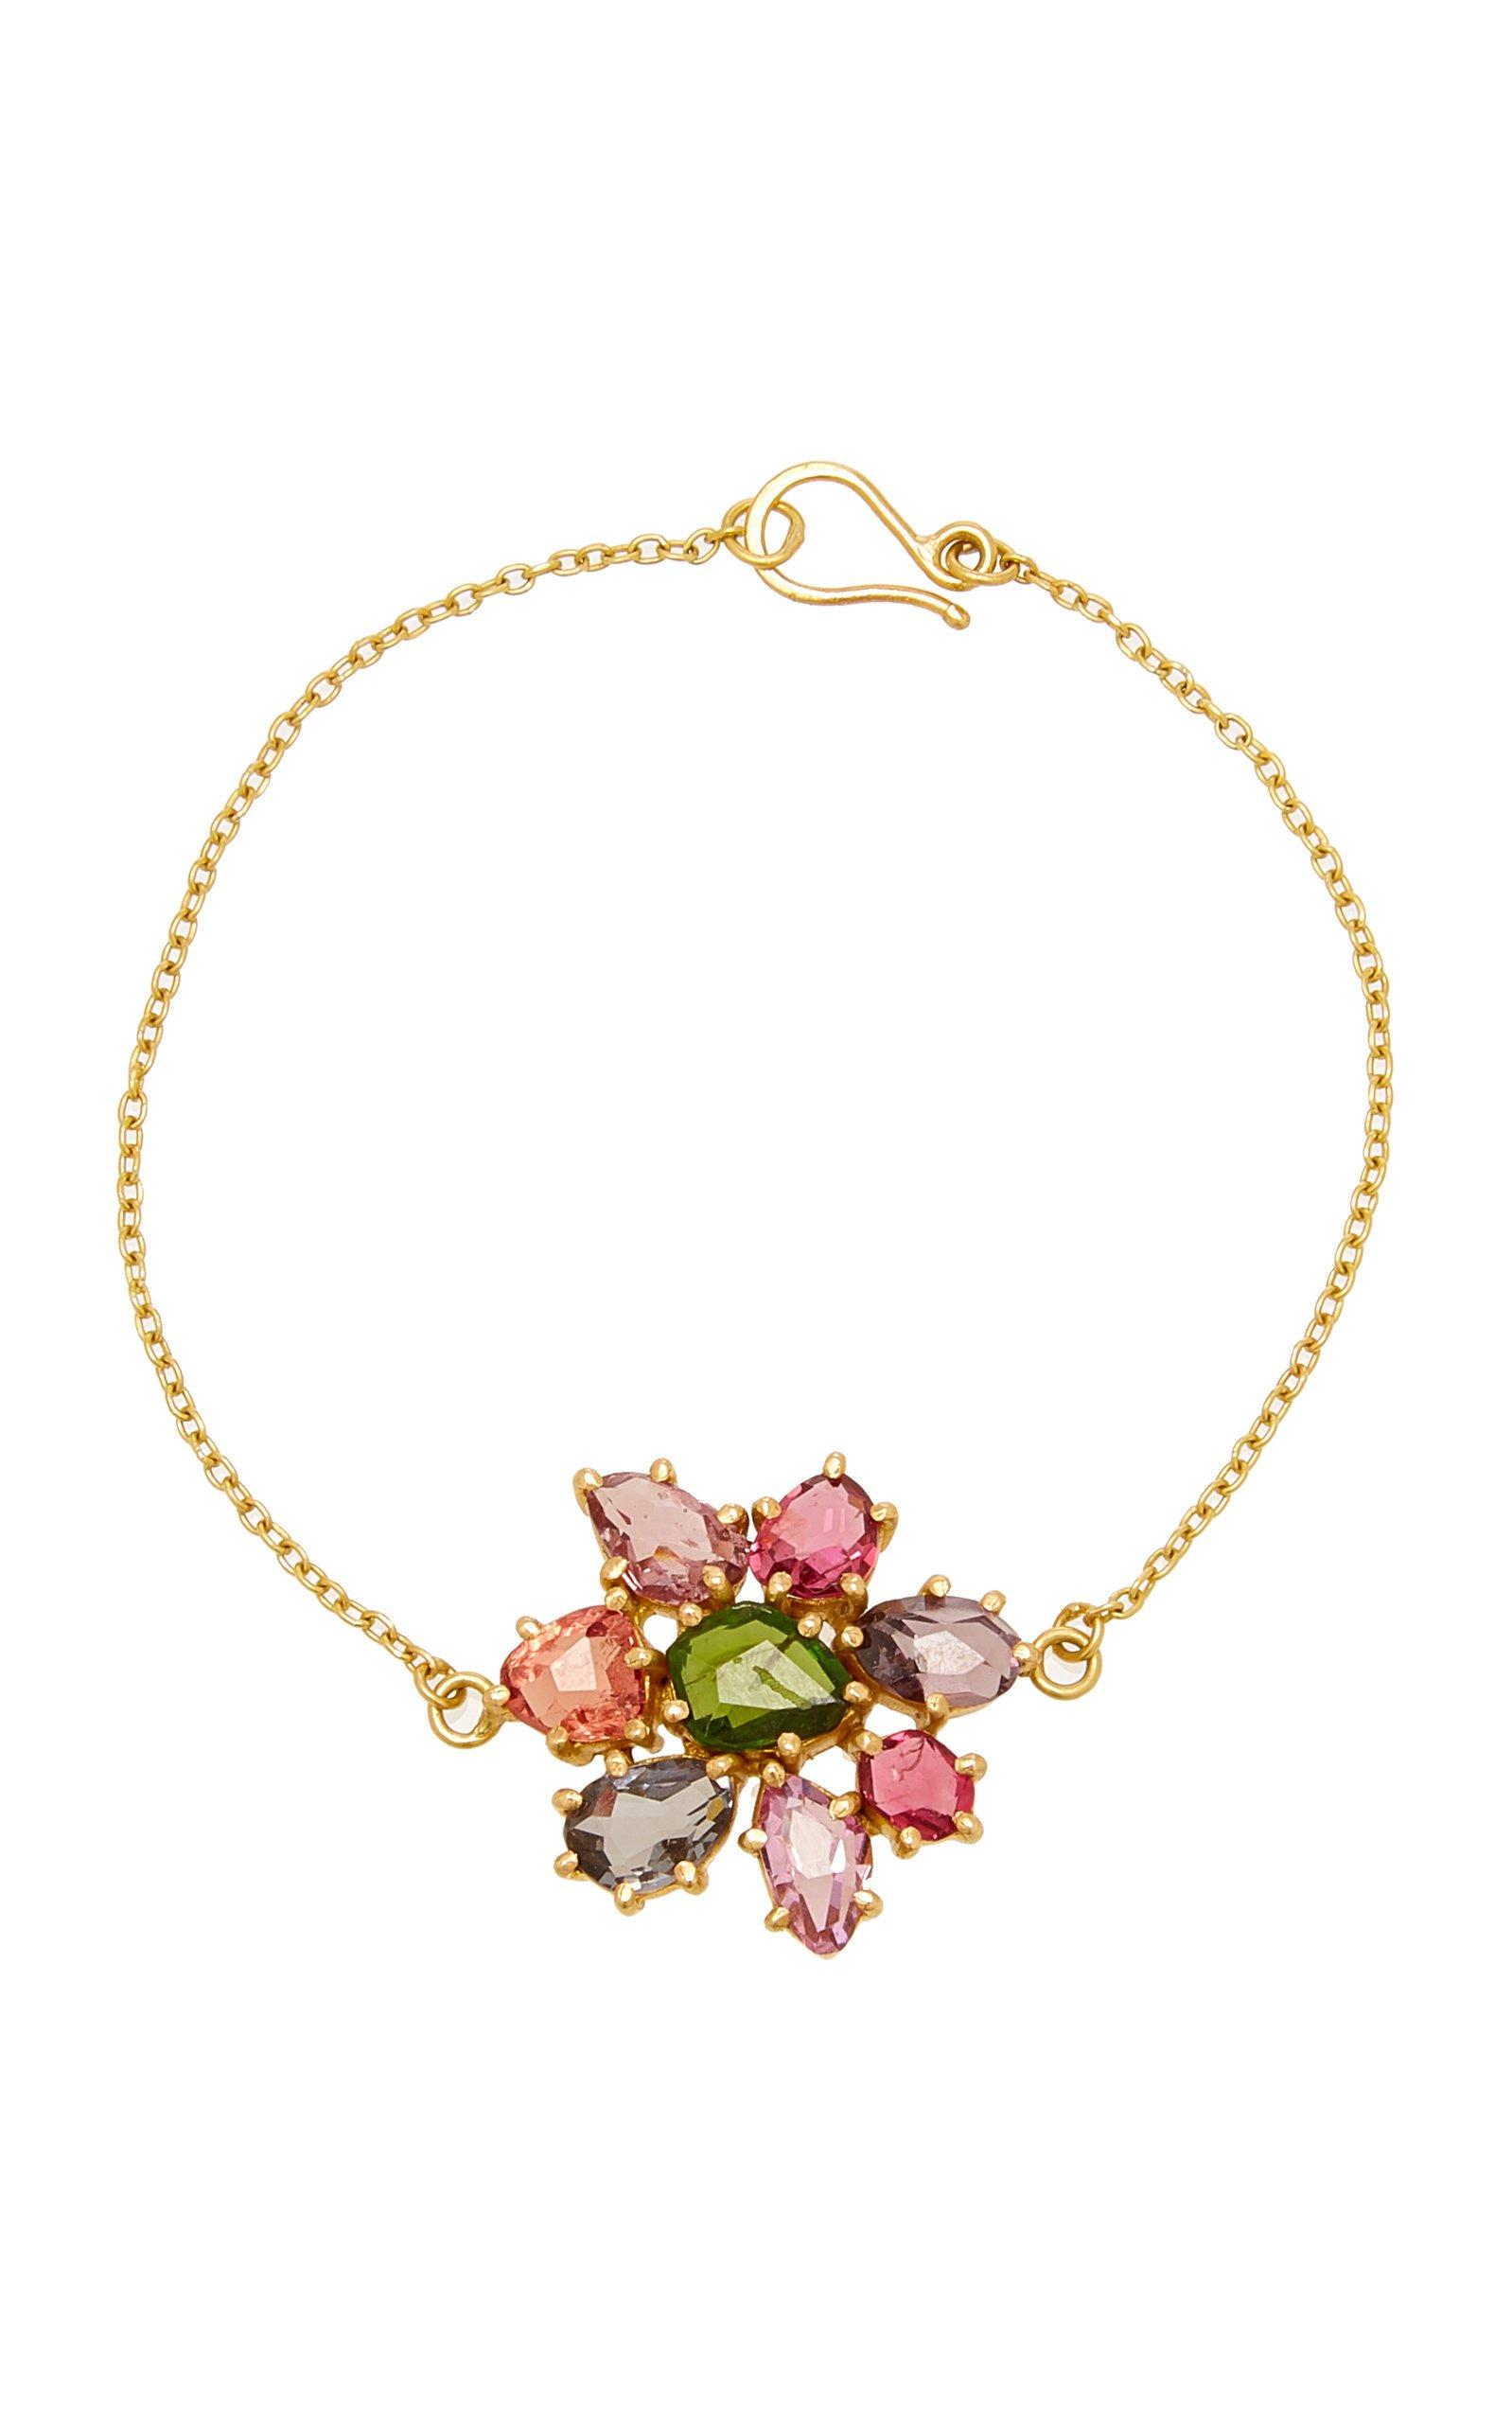 Marlar Spinel Bracelet by Pippa Small | Moda Operandi